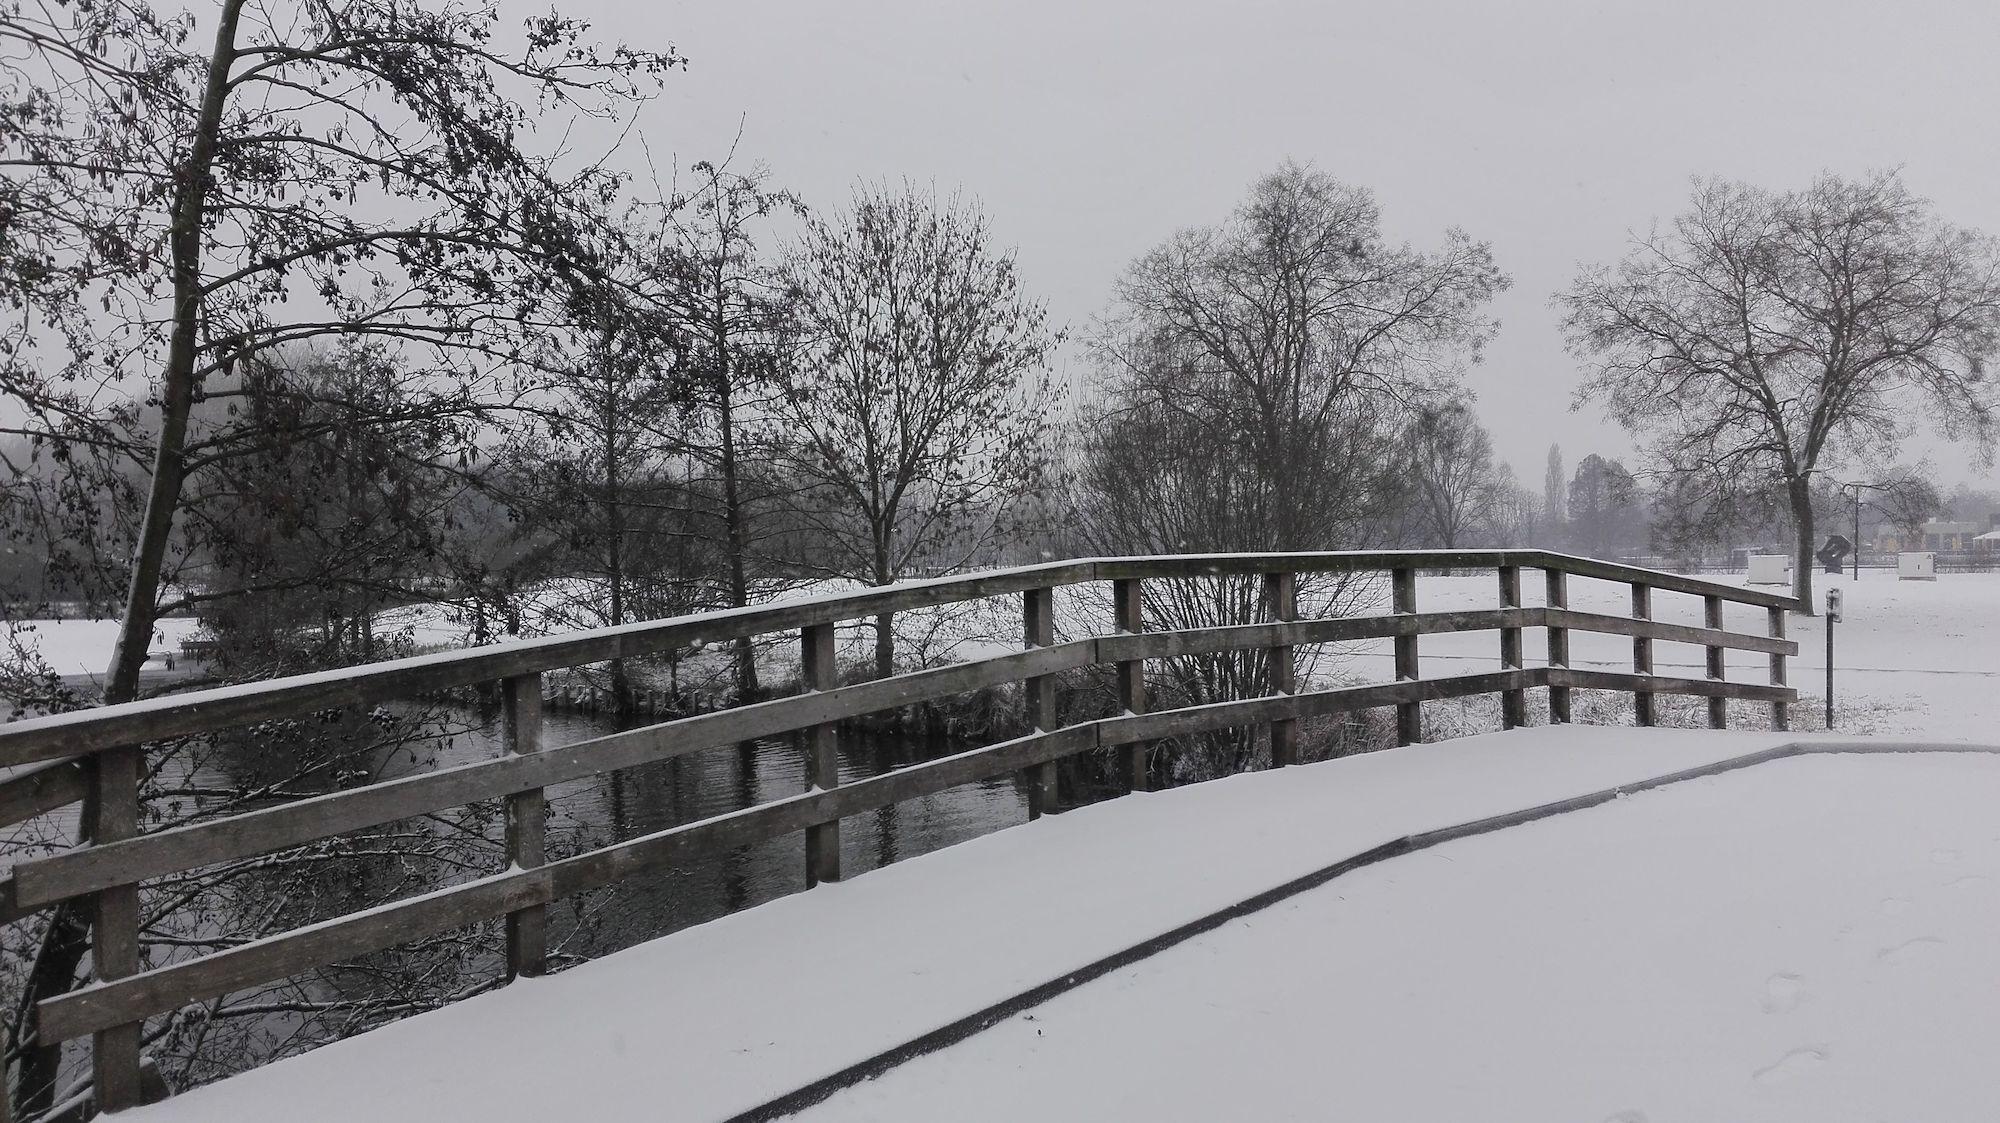 20190122 Puyenbroeck in de sneeuw